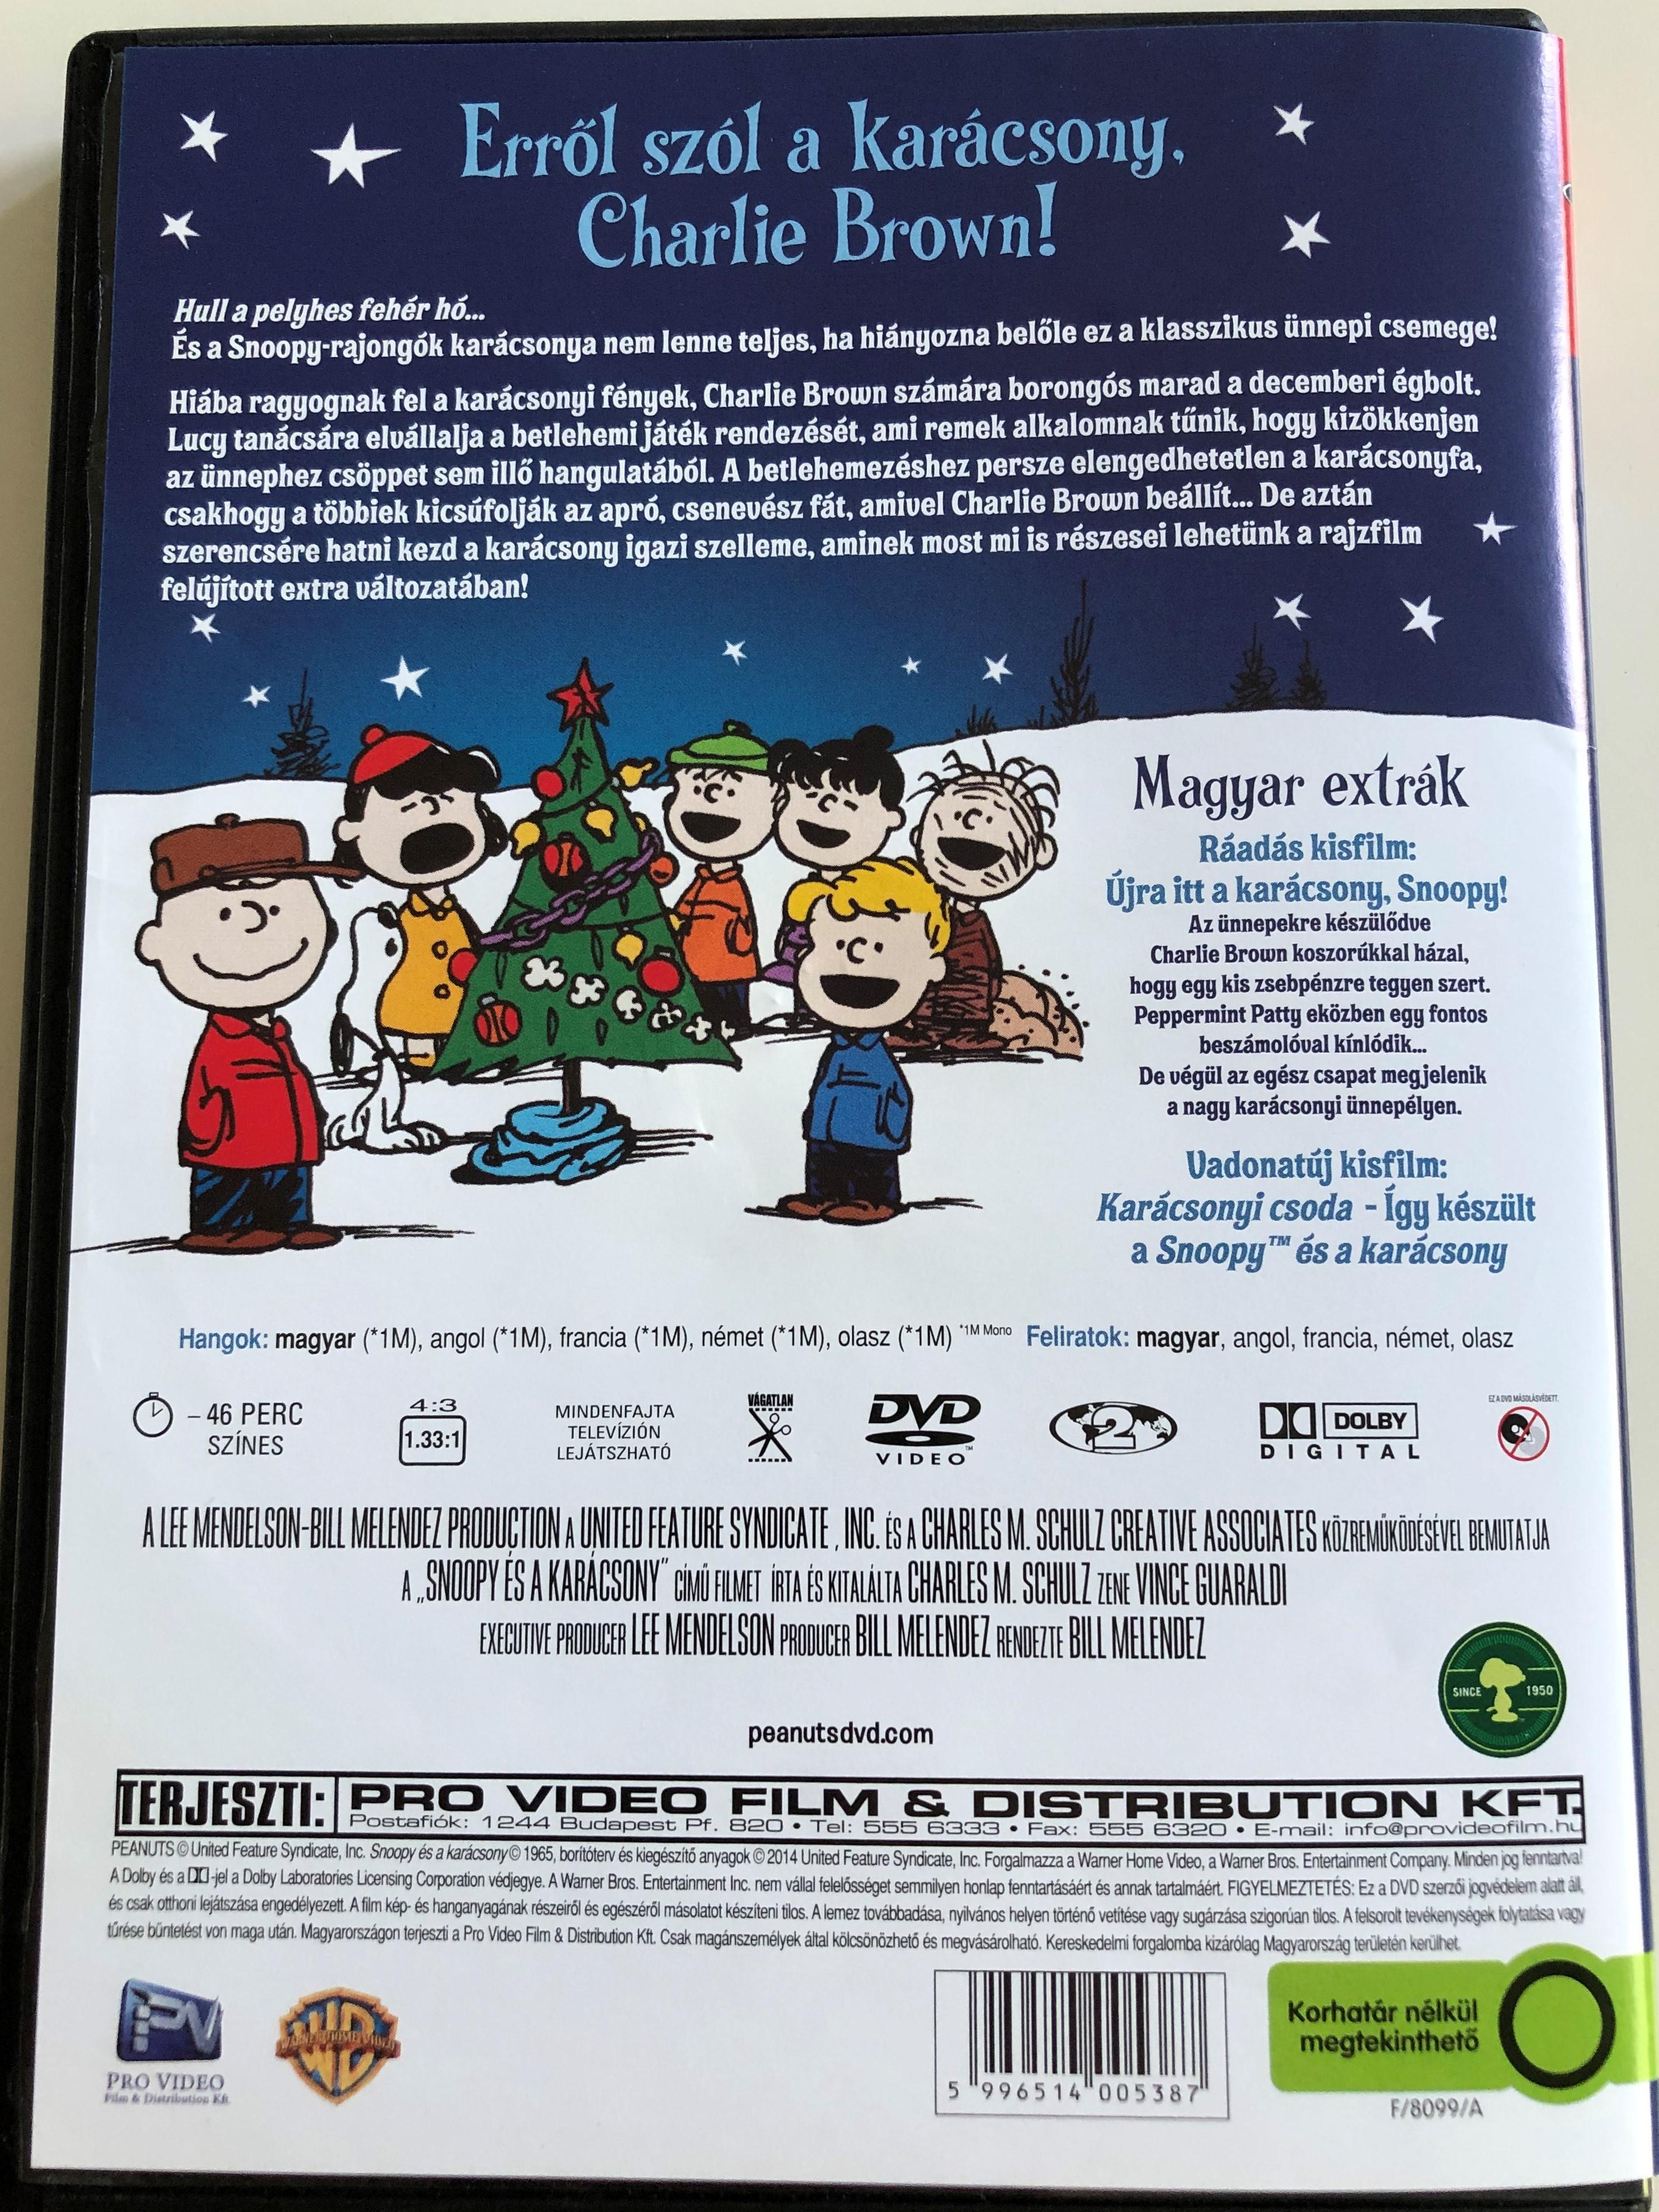 a-charlie-brown-christmas-peanuts-dvd-1965-snoopy-s-a-kar-csony-directed-by-bill-melendez-with-bonus-snoopy-cartoon-2-.jpg